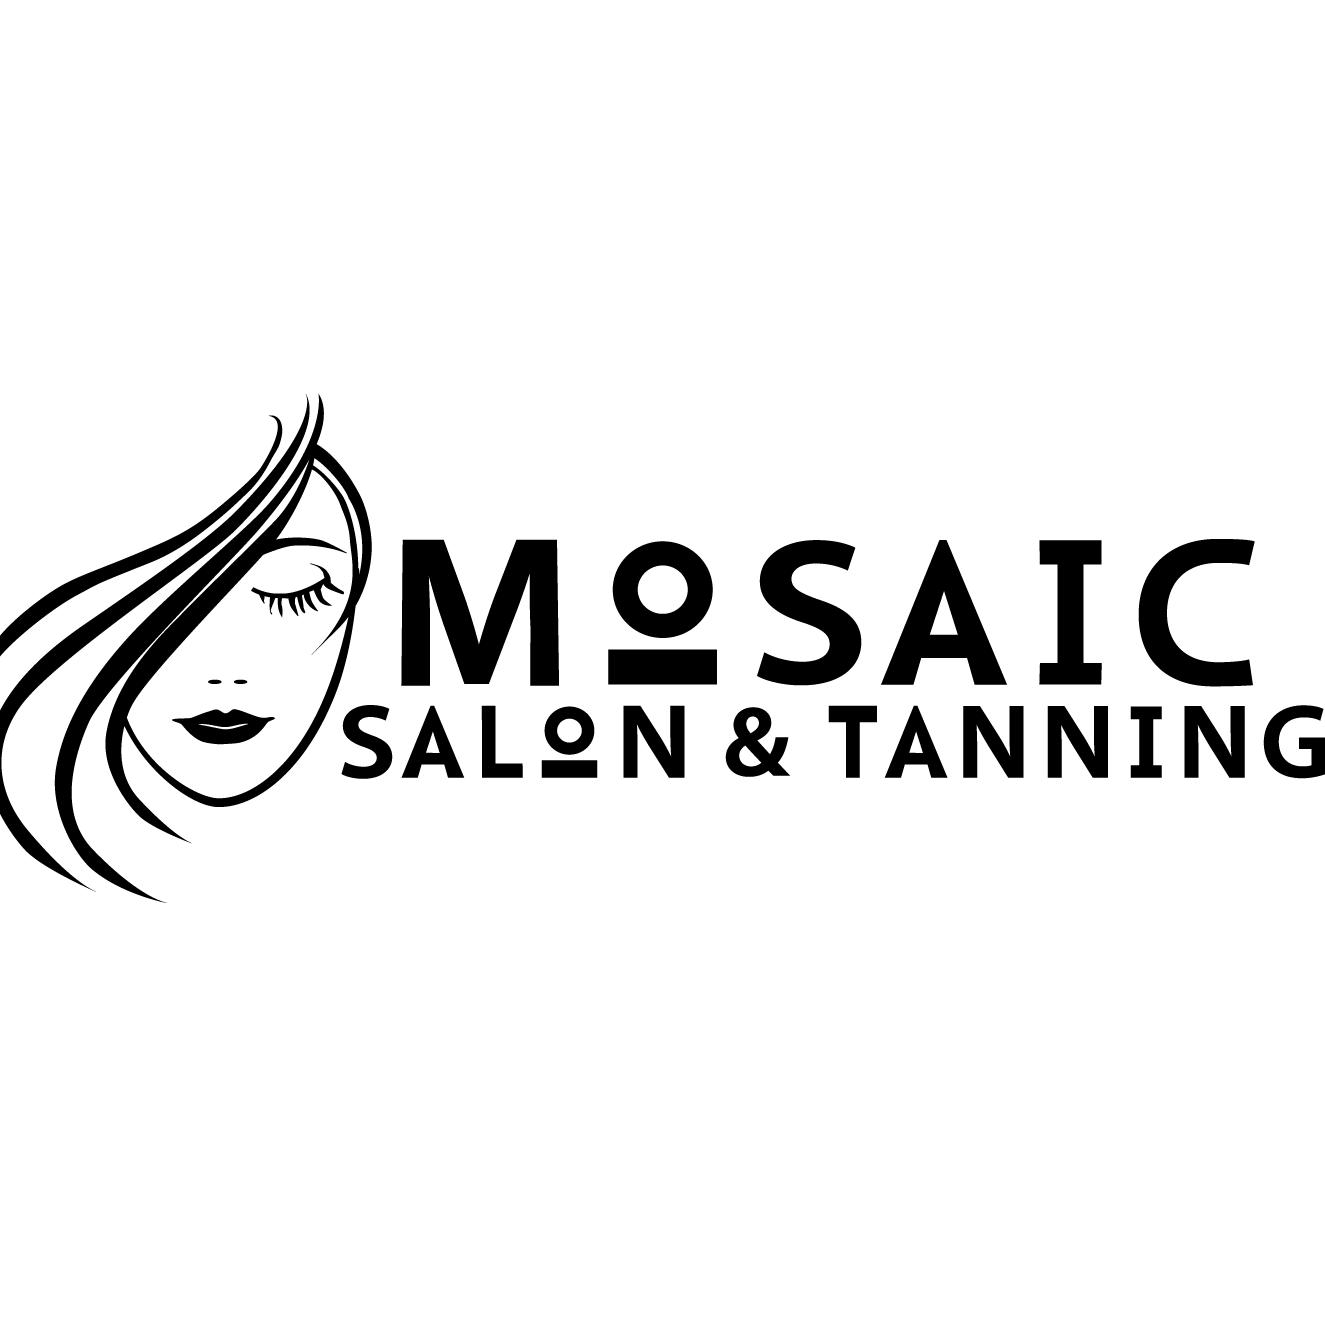 Mosaic Salon & Tanning